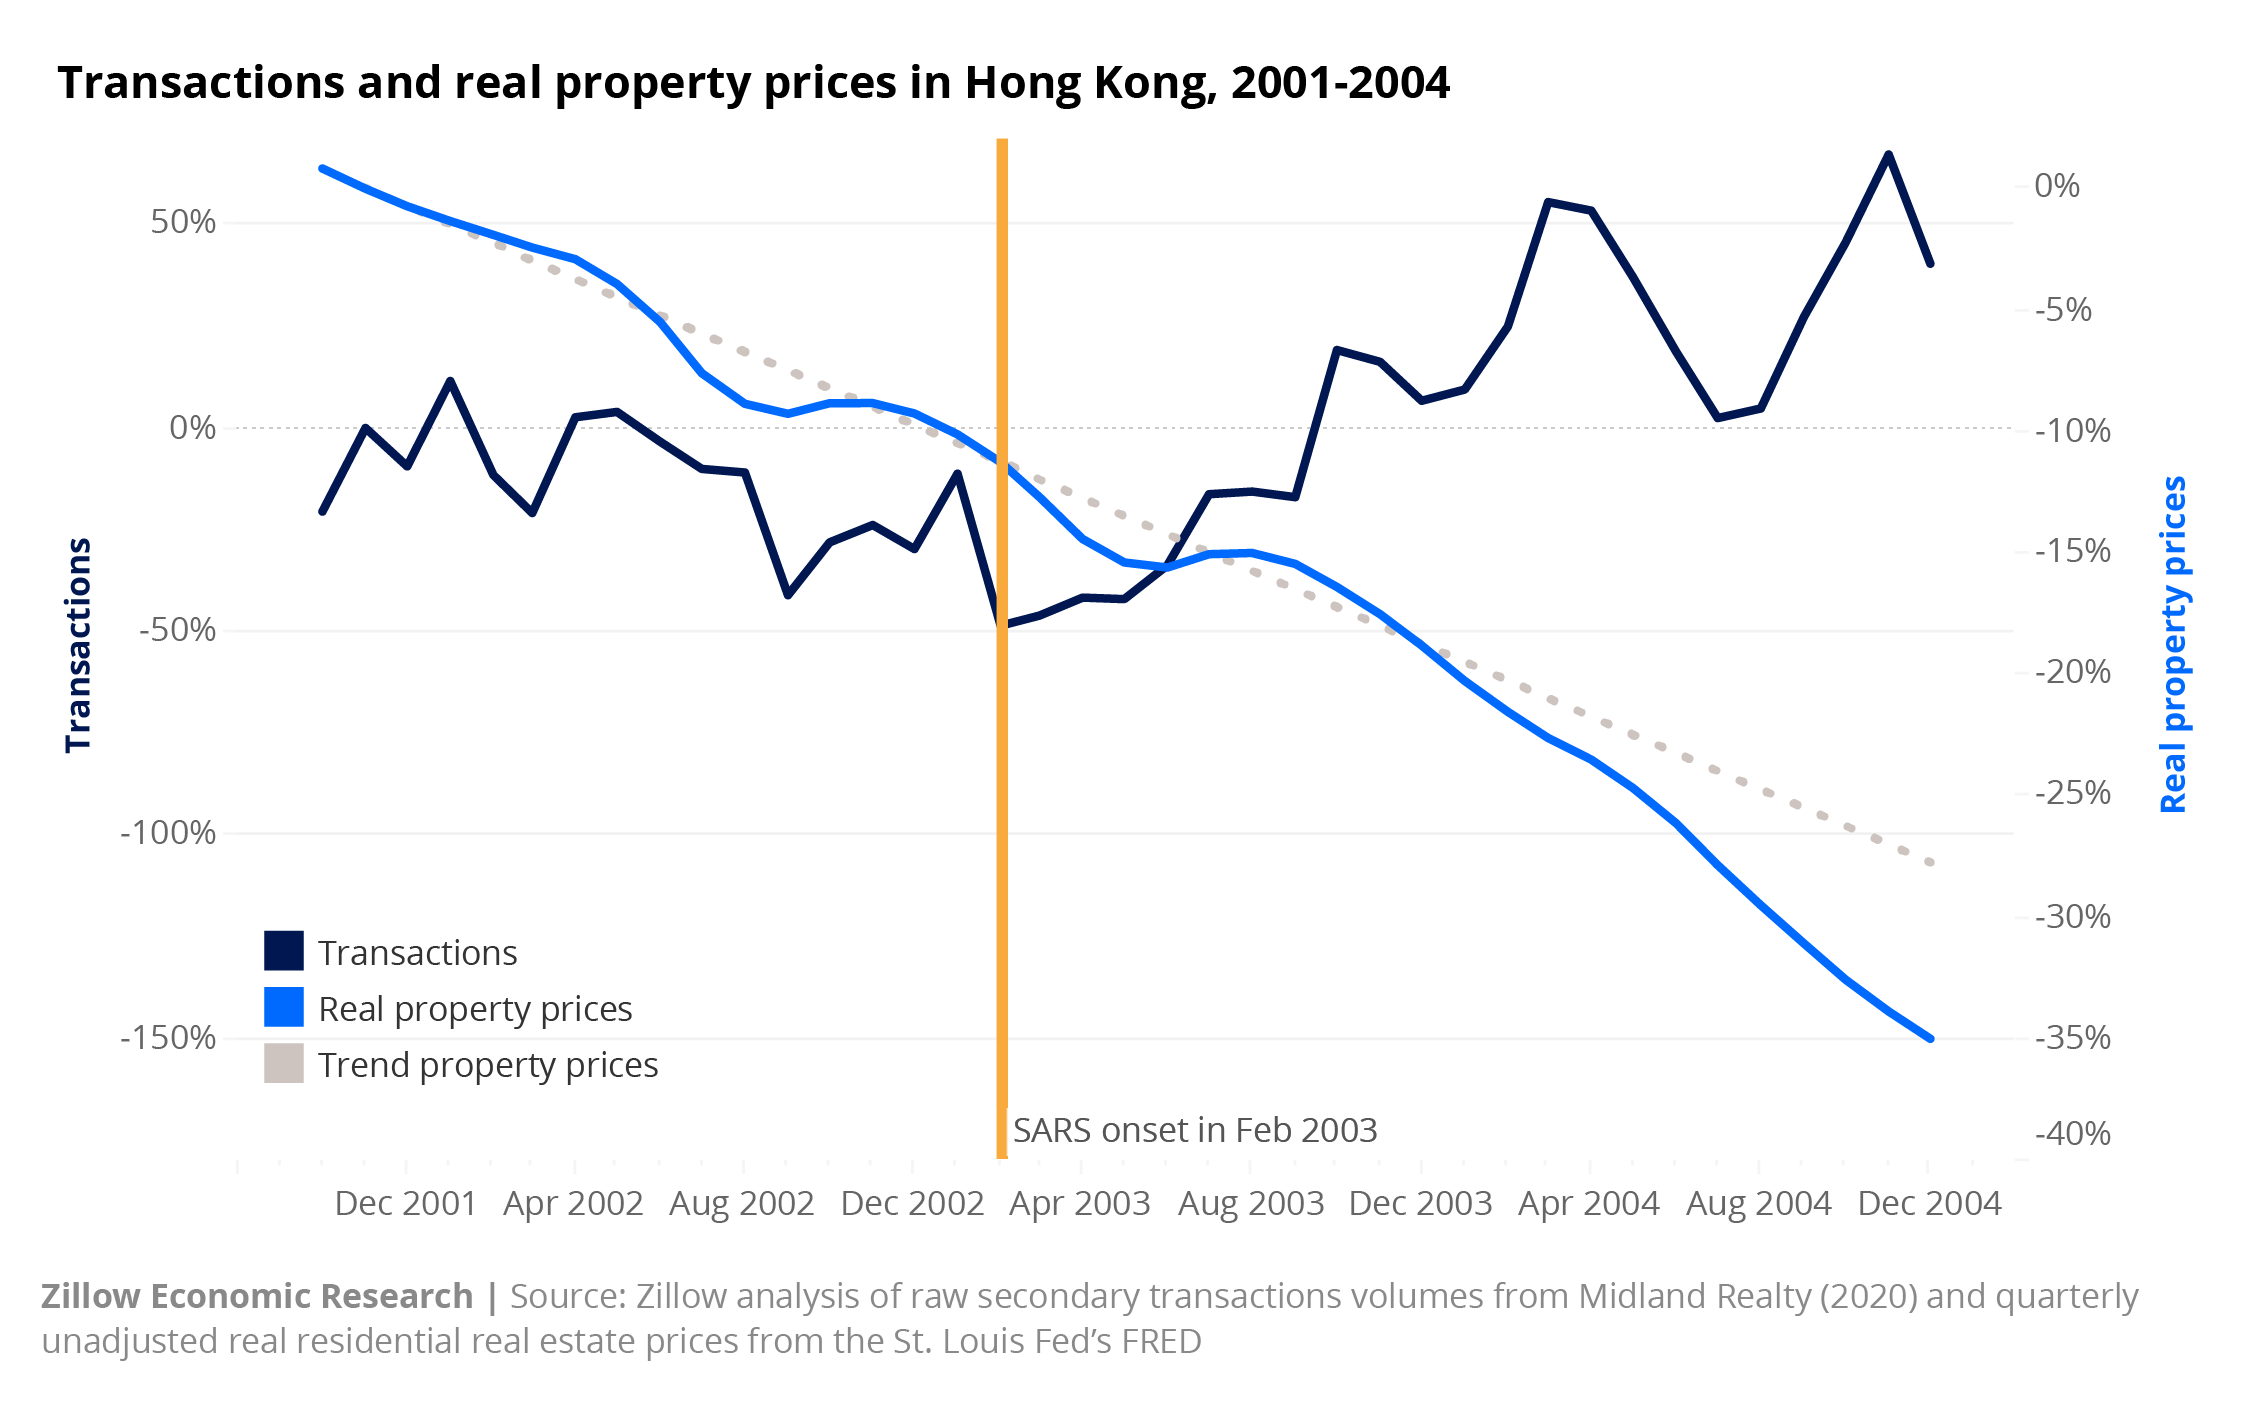 Hong Kong real estate market during the SARS outbreak